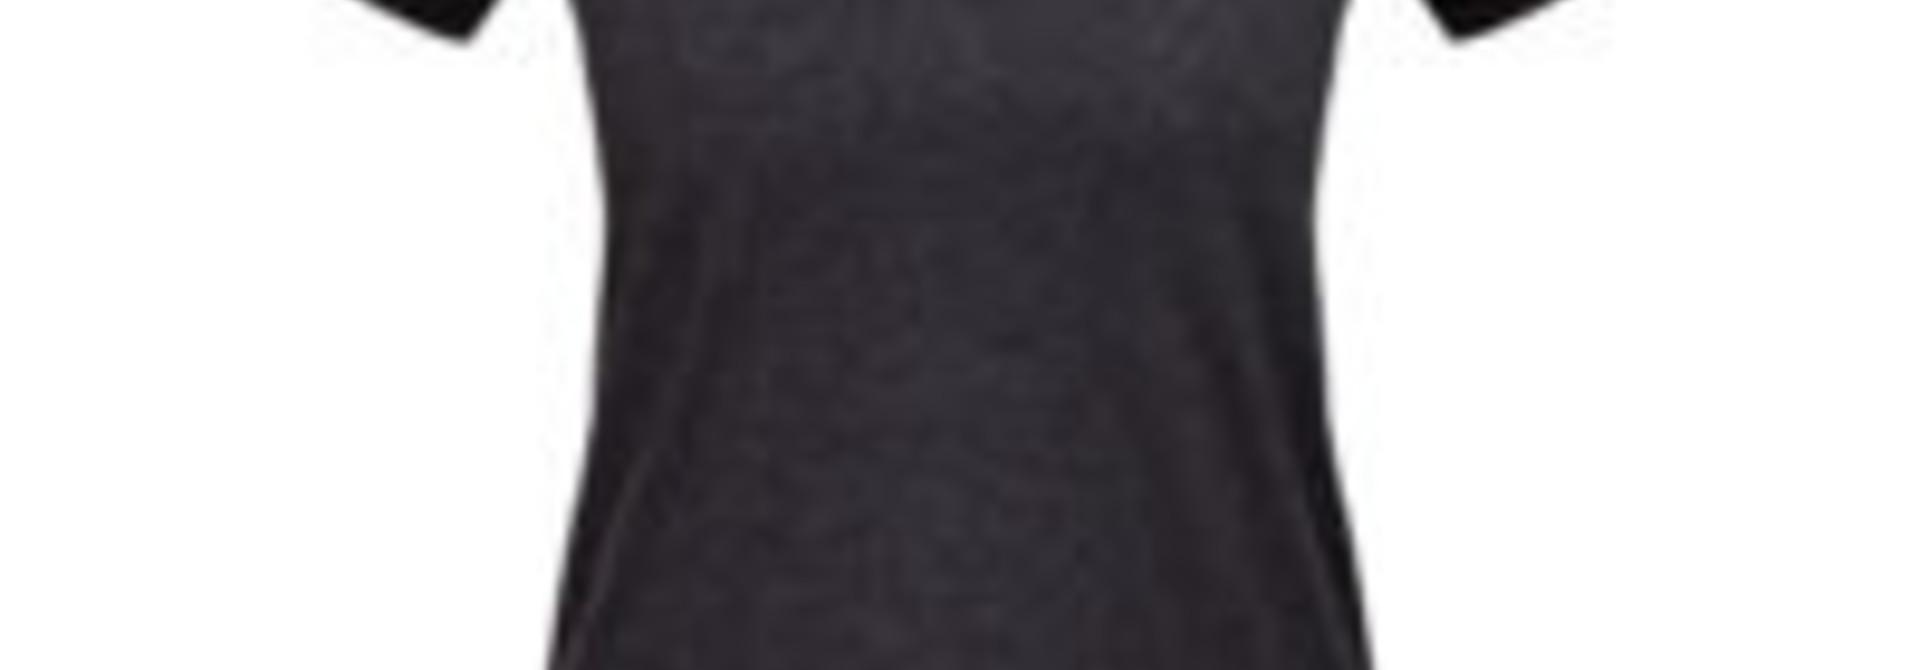 Shredly - the HONEYCOMB SHORT SLEEVE - Charcoal/Black - Size M